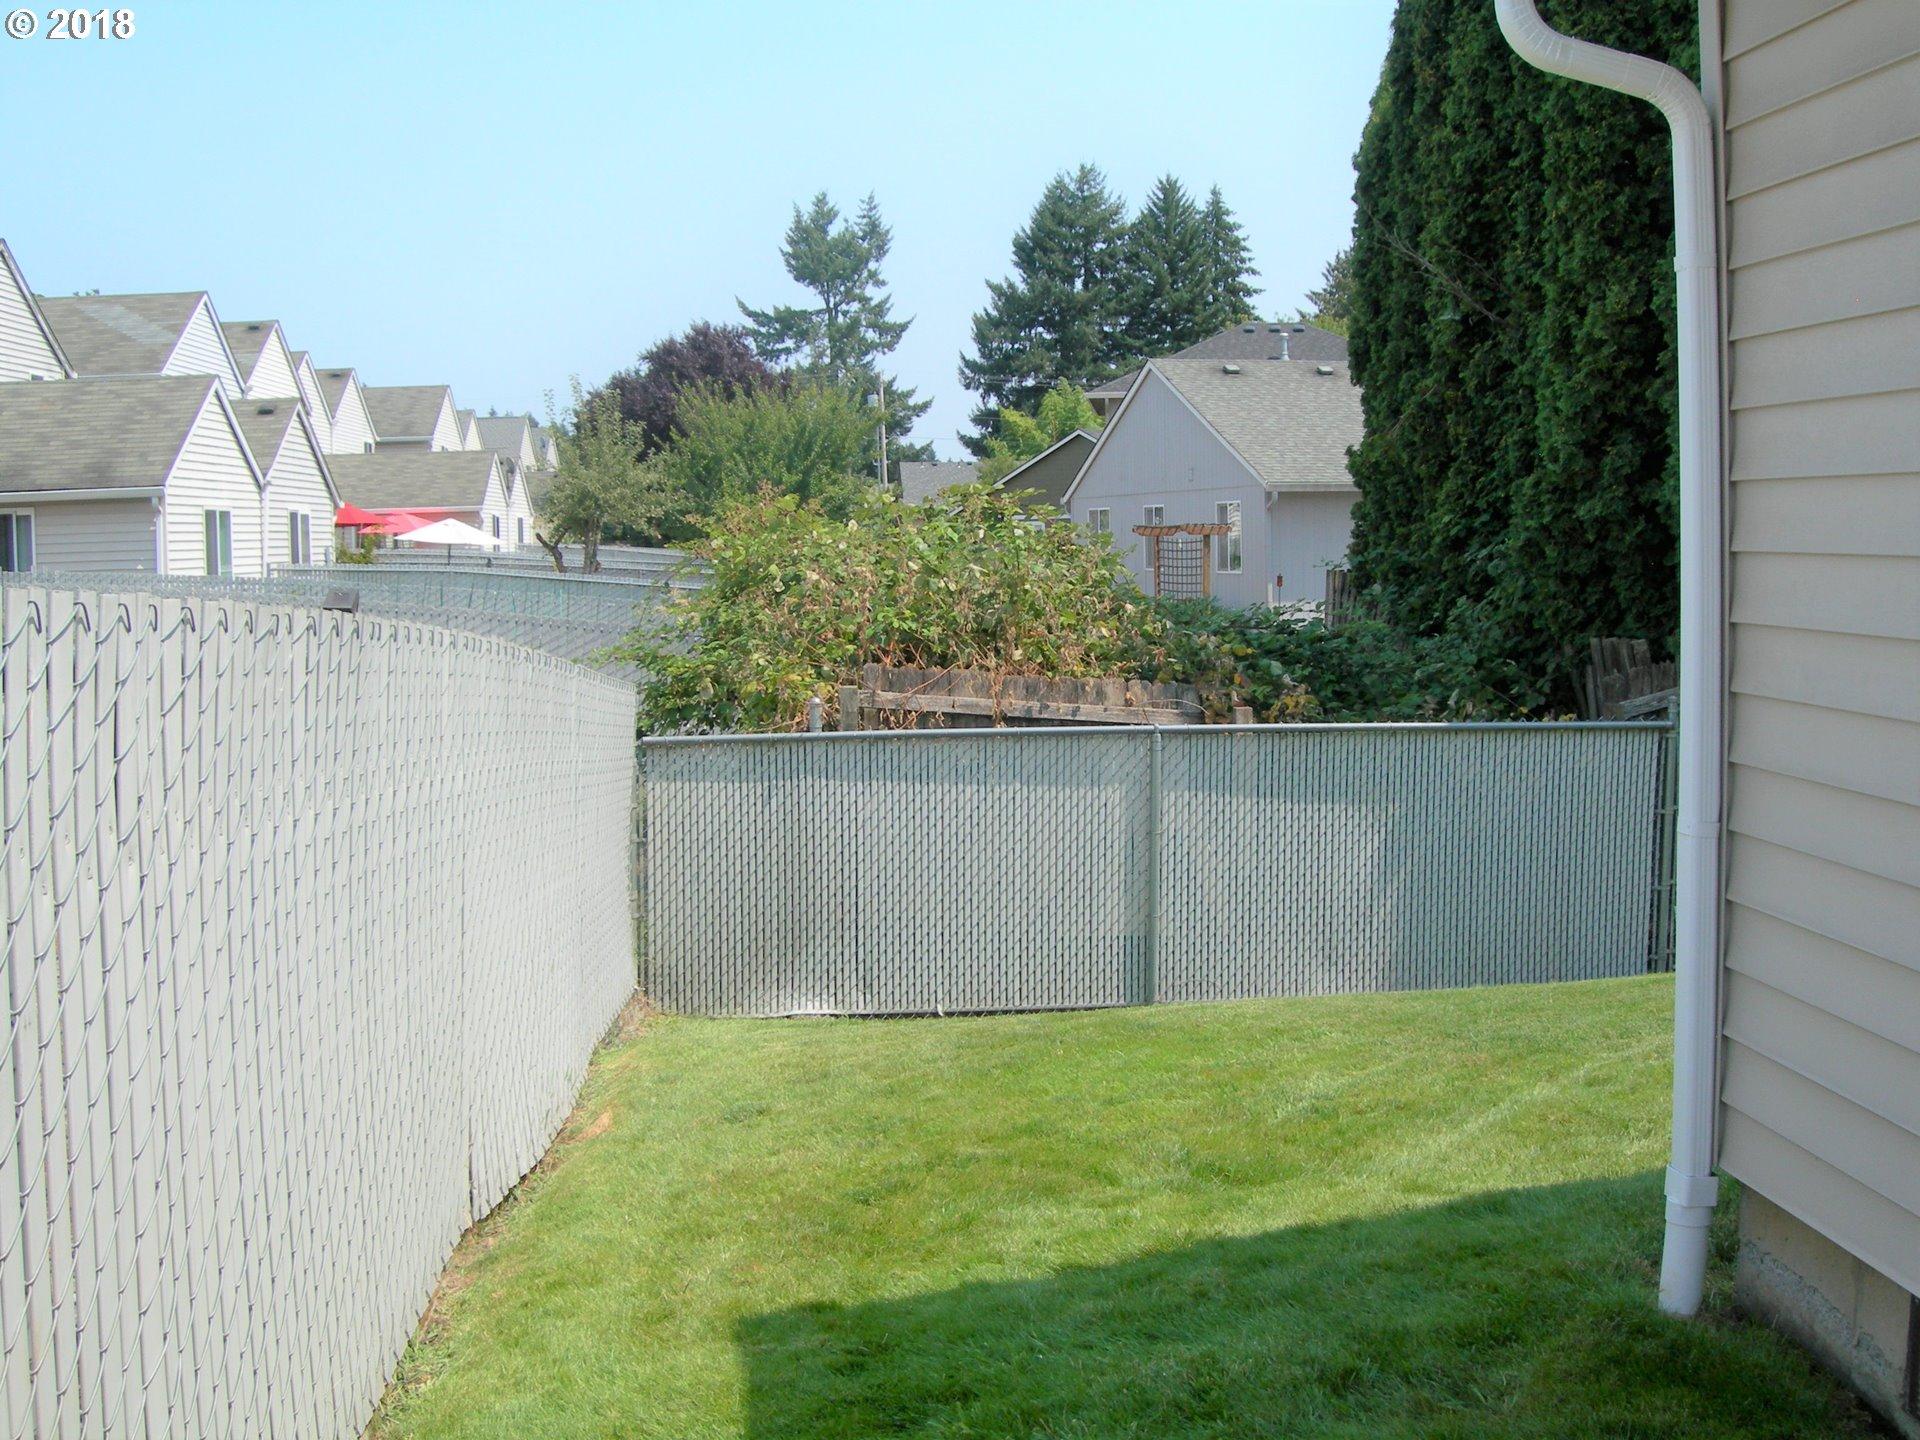 3007 NE 116TH AVE Vancouver, WA 98682 - MLS #: 18696408